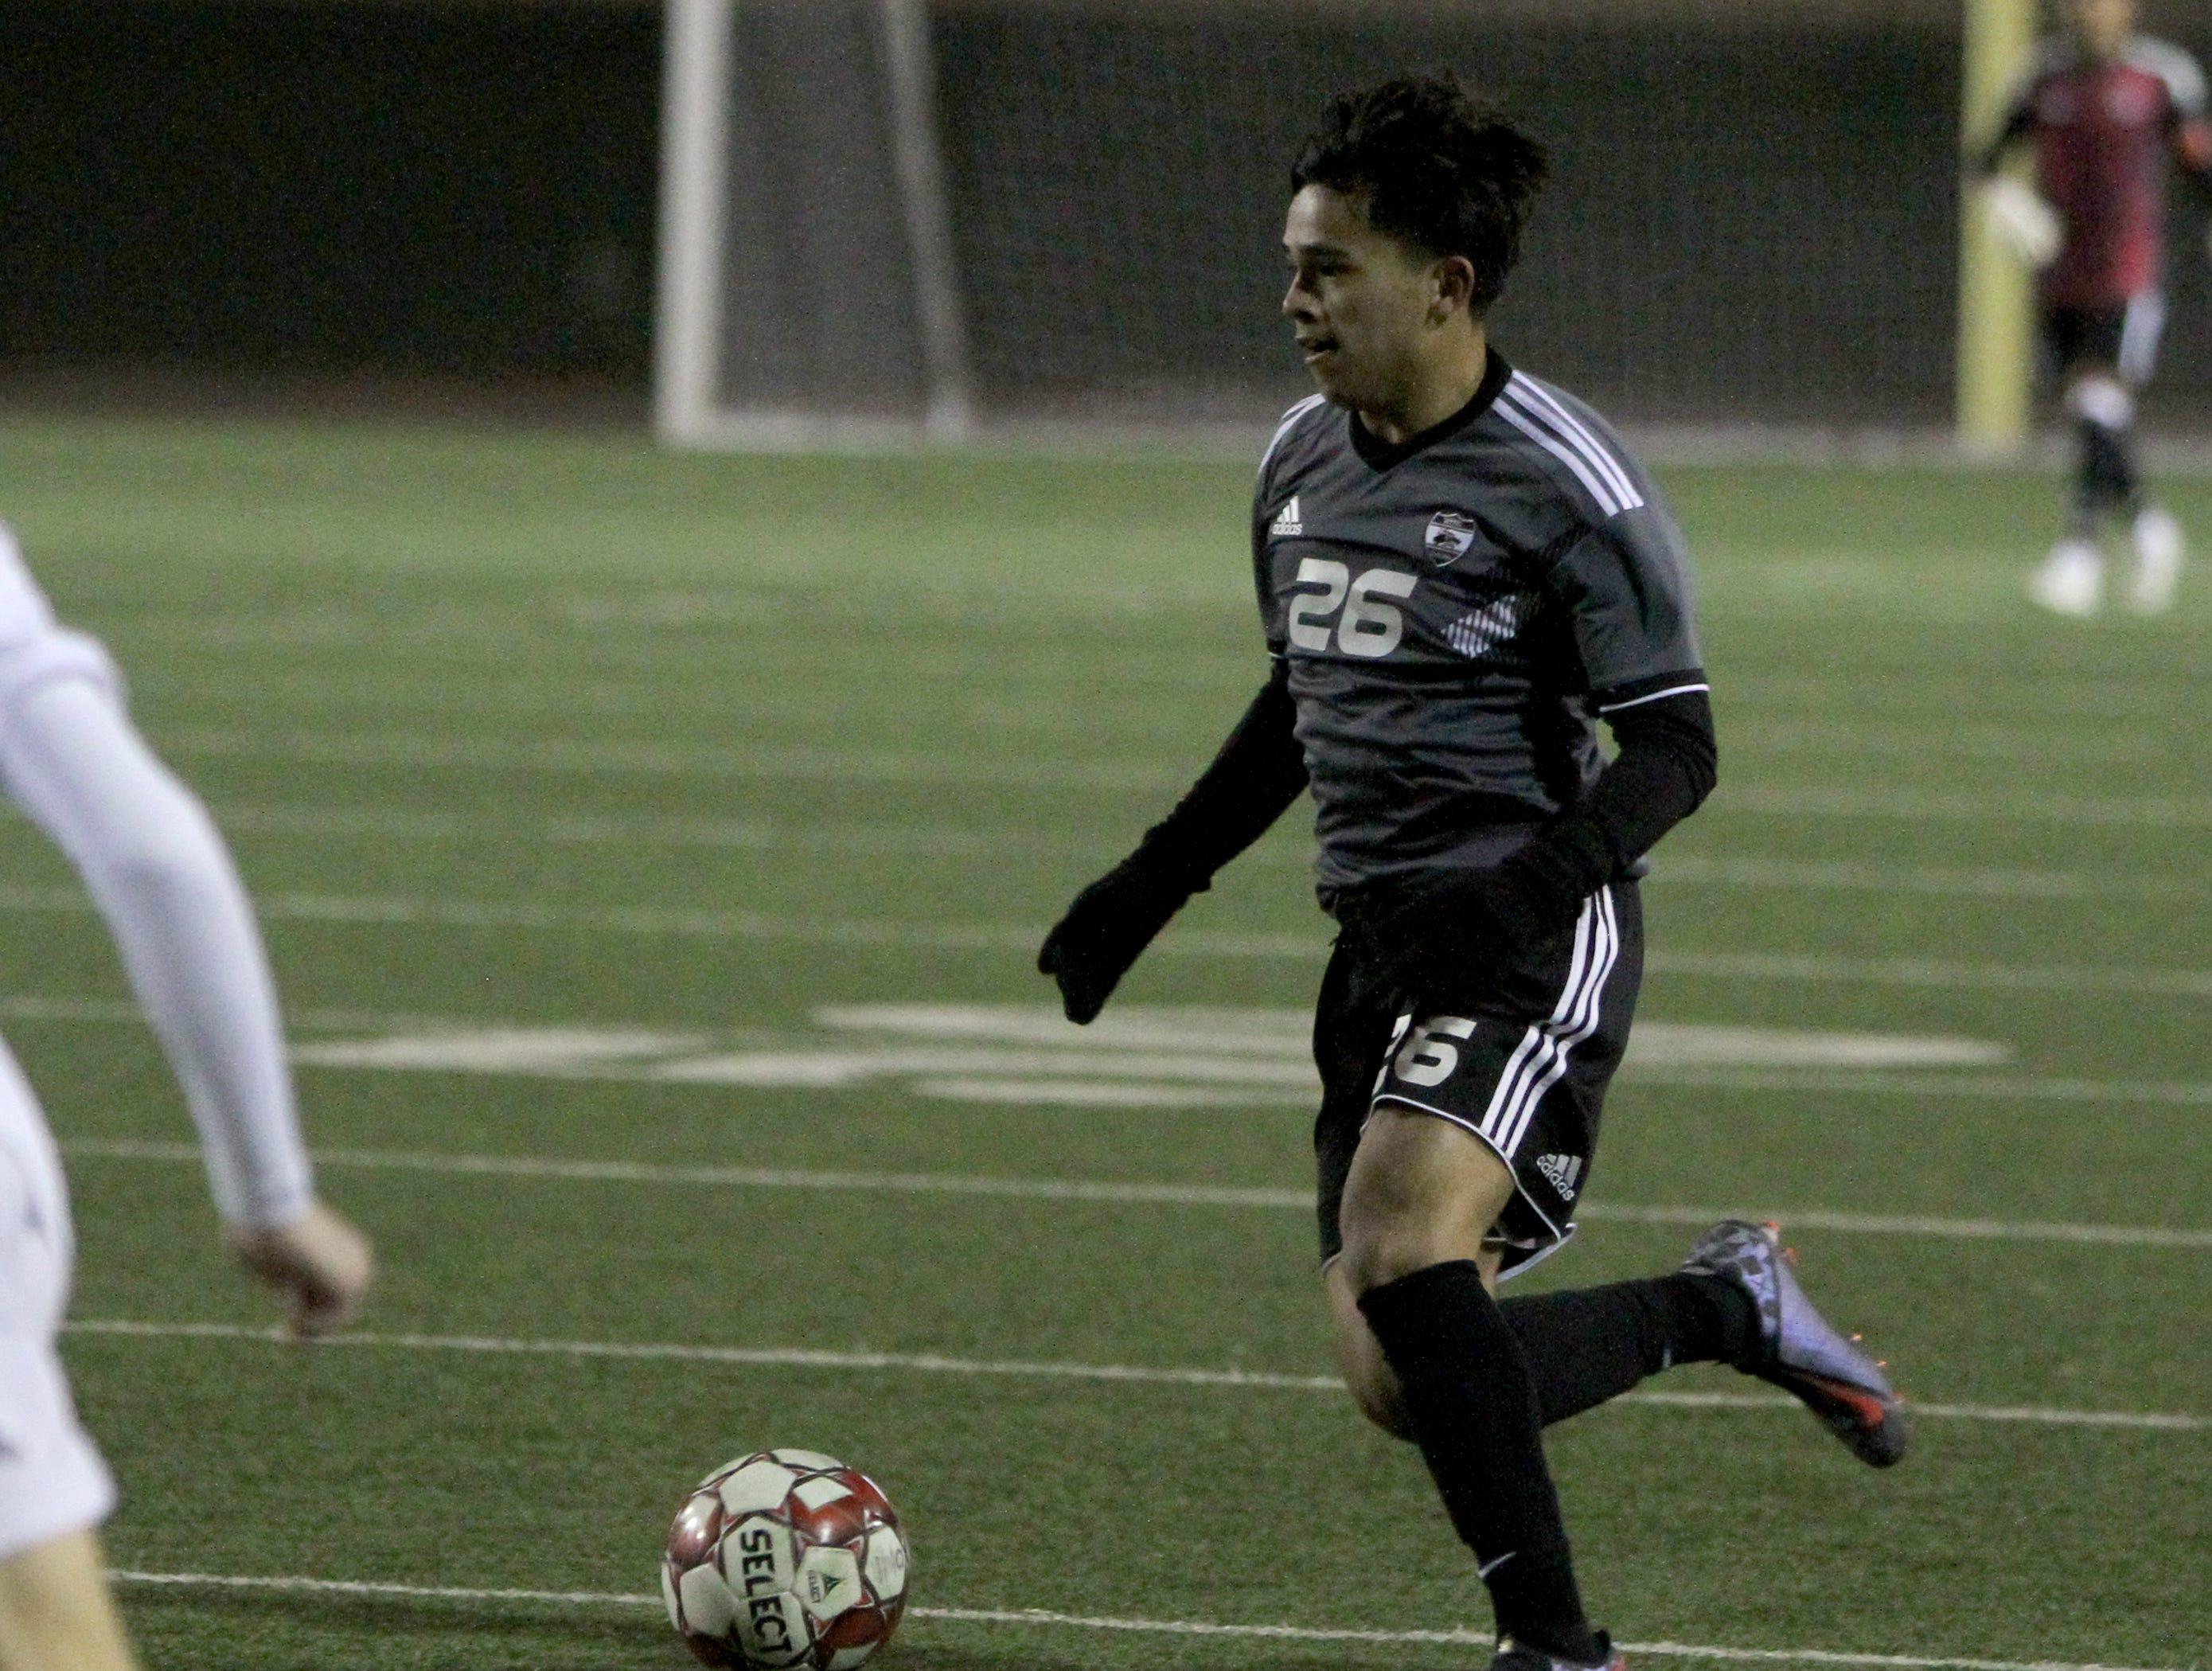 Wichita Falls High School's Julio Vasquez dribbles in the match against Aledo Tuesday, March 5, 2019, at Memorial Stadium.